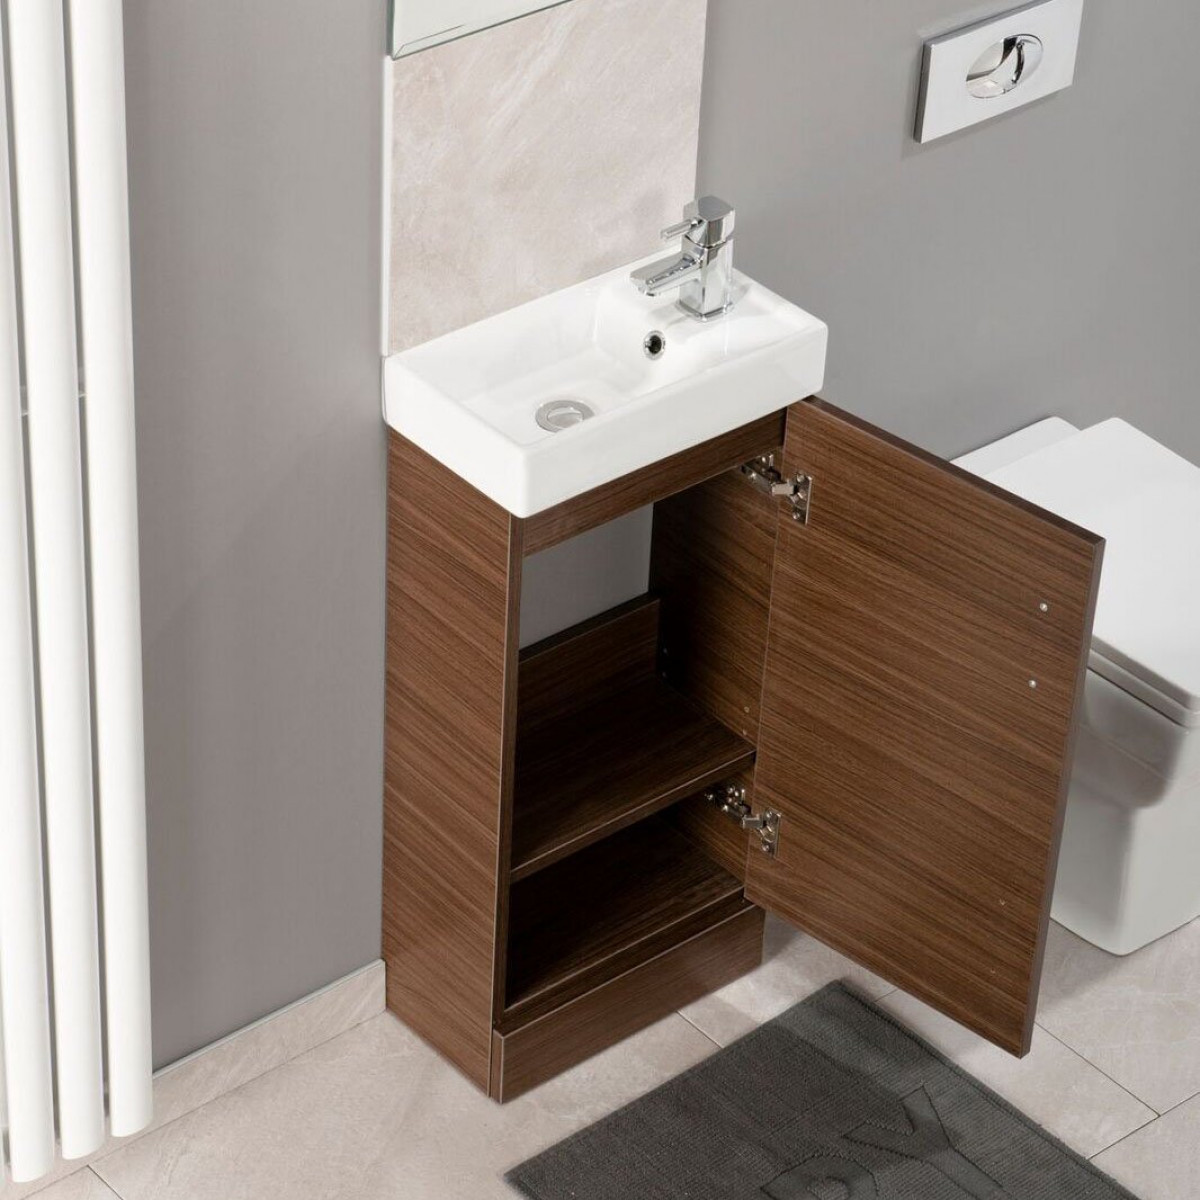 Cassellie cube single door vanity unit in walnut 400mm for Bathroom cabinets 400mm wide